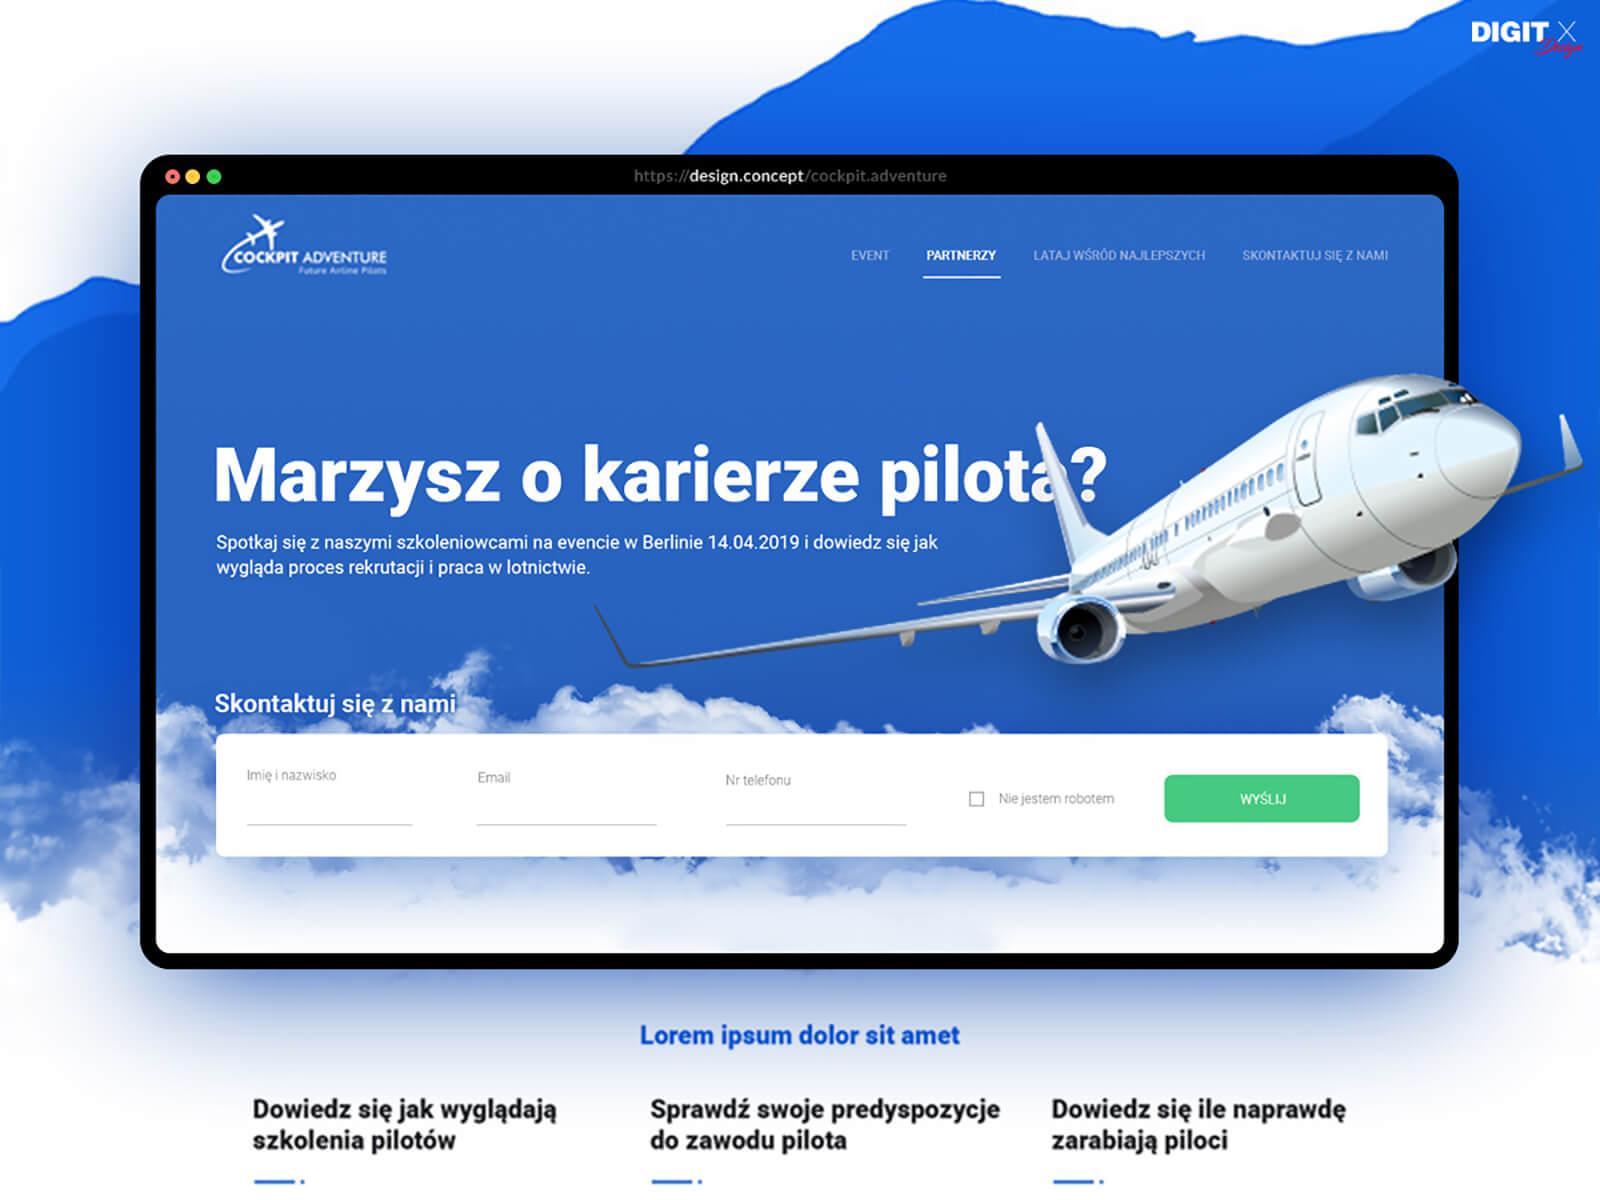 Concept - CockpitAdventure cover image